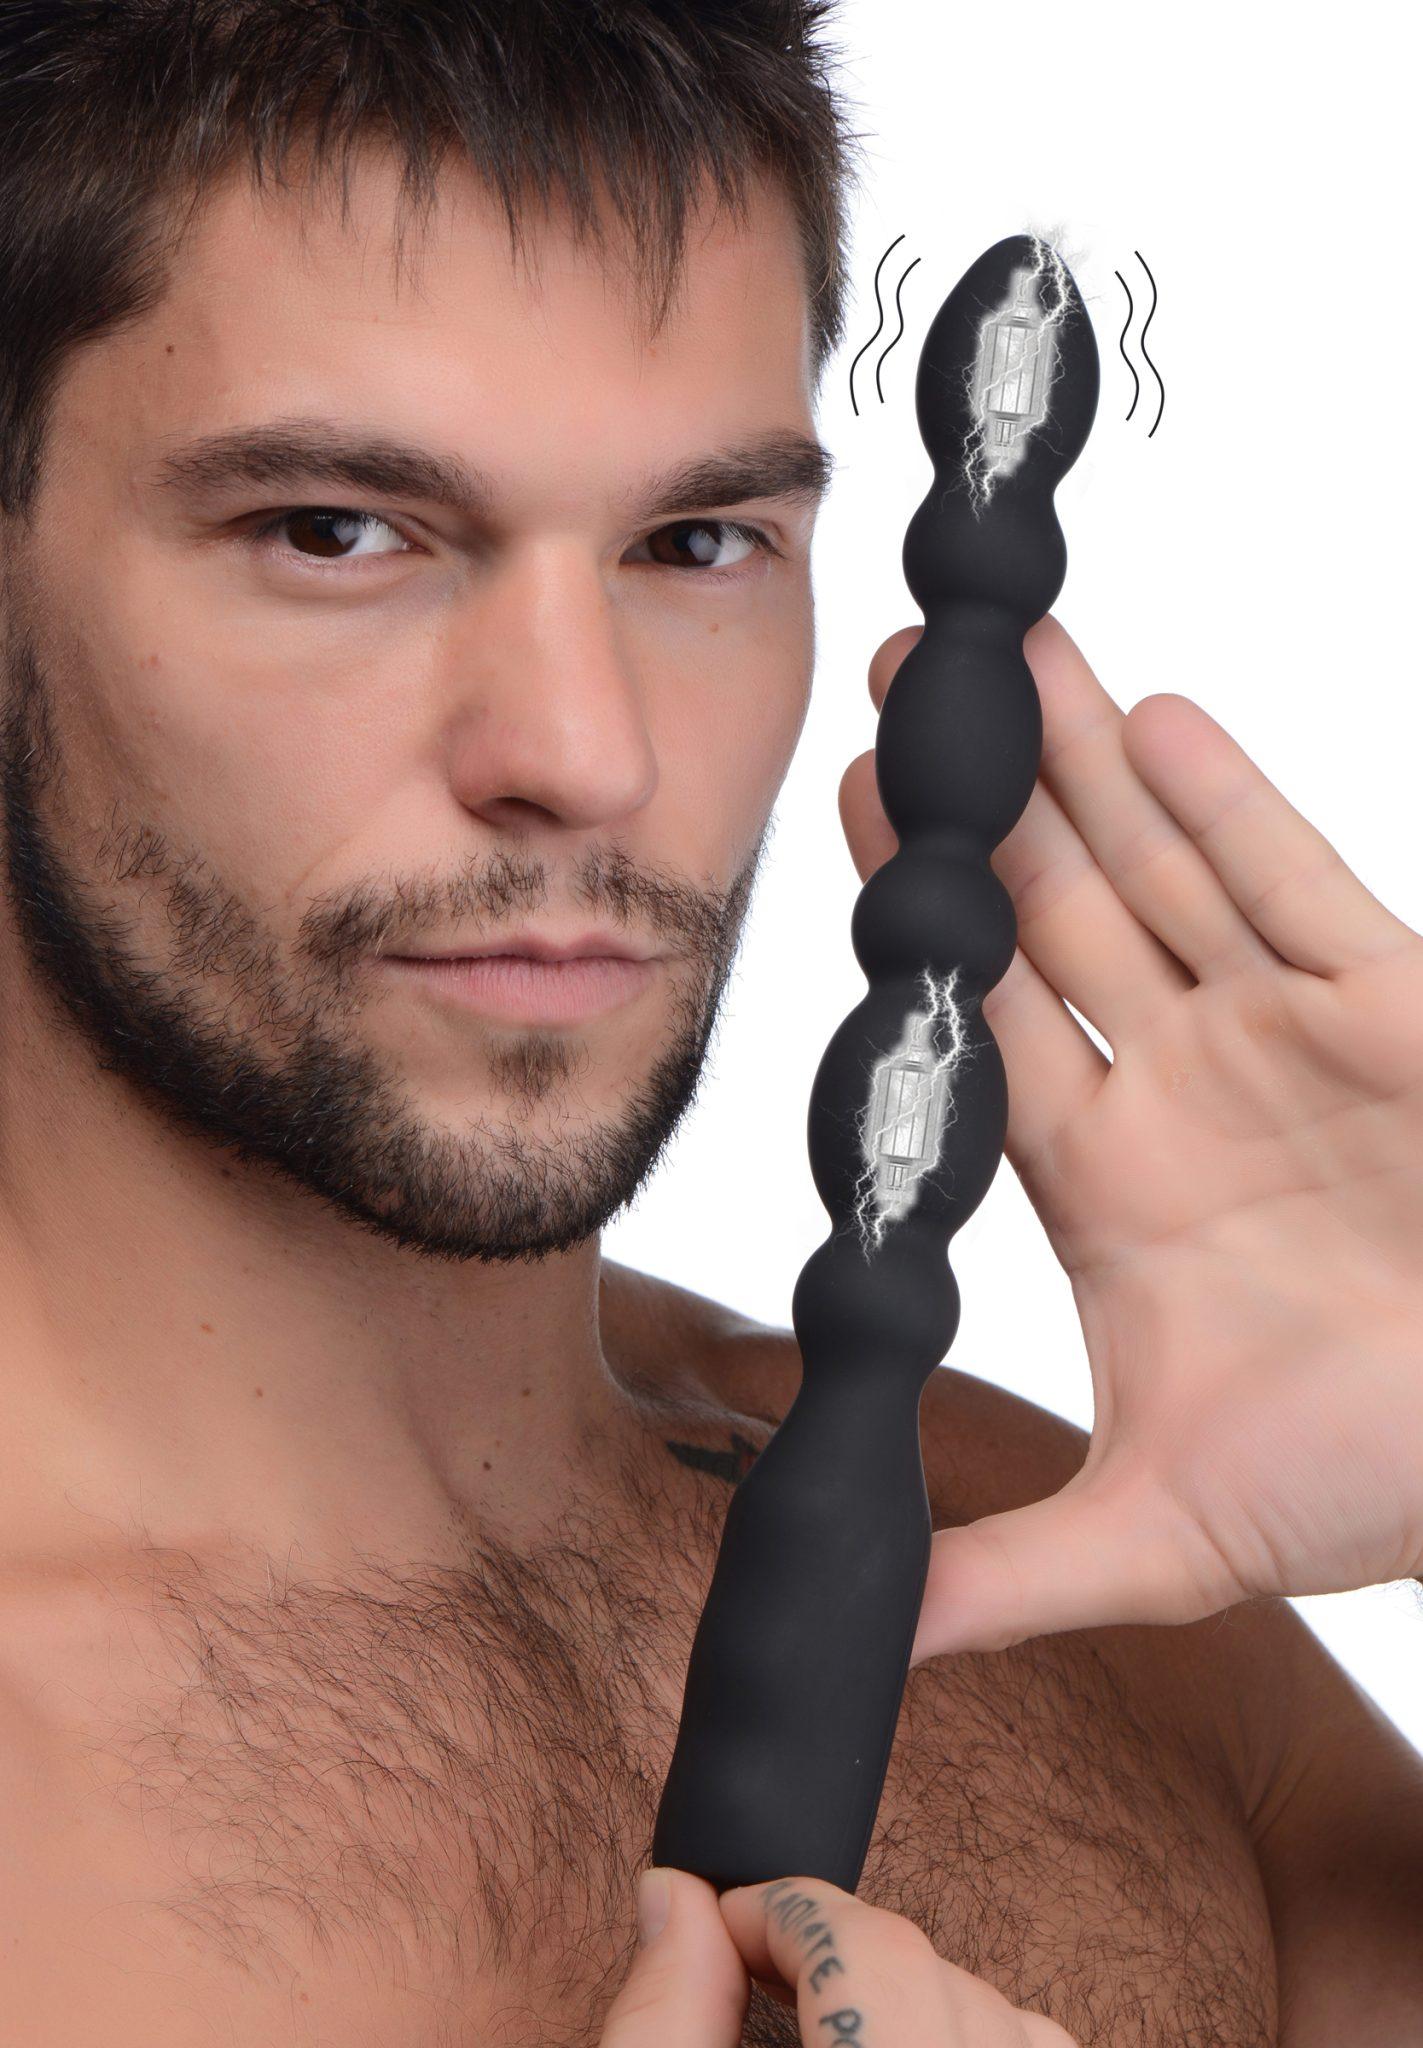 Viper Anal Beads Silicone Dual Motor Vibrator